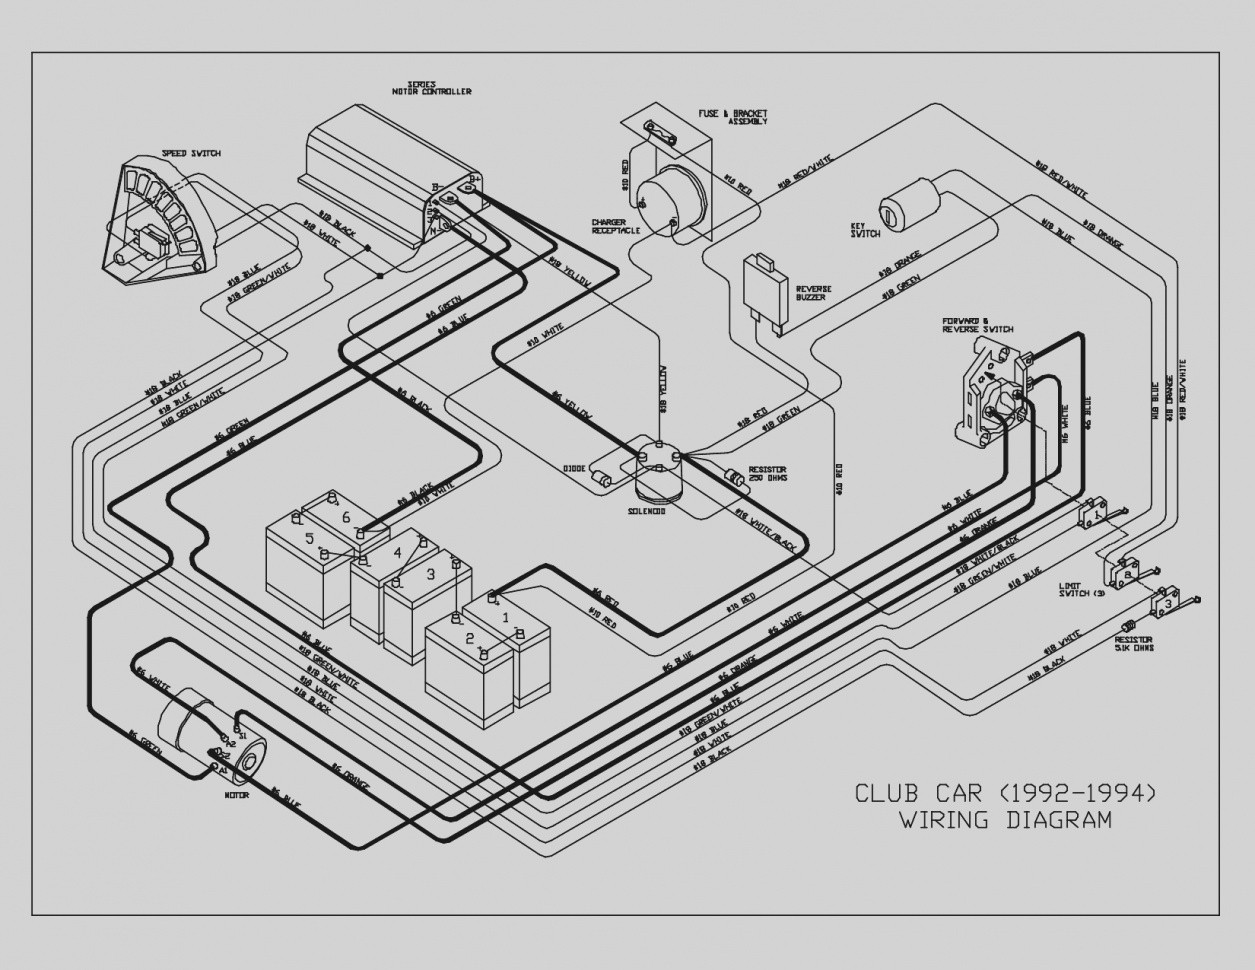 Trend Ez Go Textron Wiring Diagram Wiringam Ezgo Rxv Gas Golf Cart Club Car  Battery Trend Ez Go Textron Wiring Diagram 36 Volt Battery Charger ...